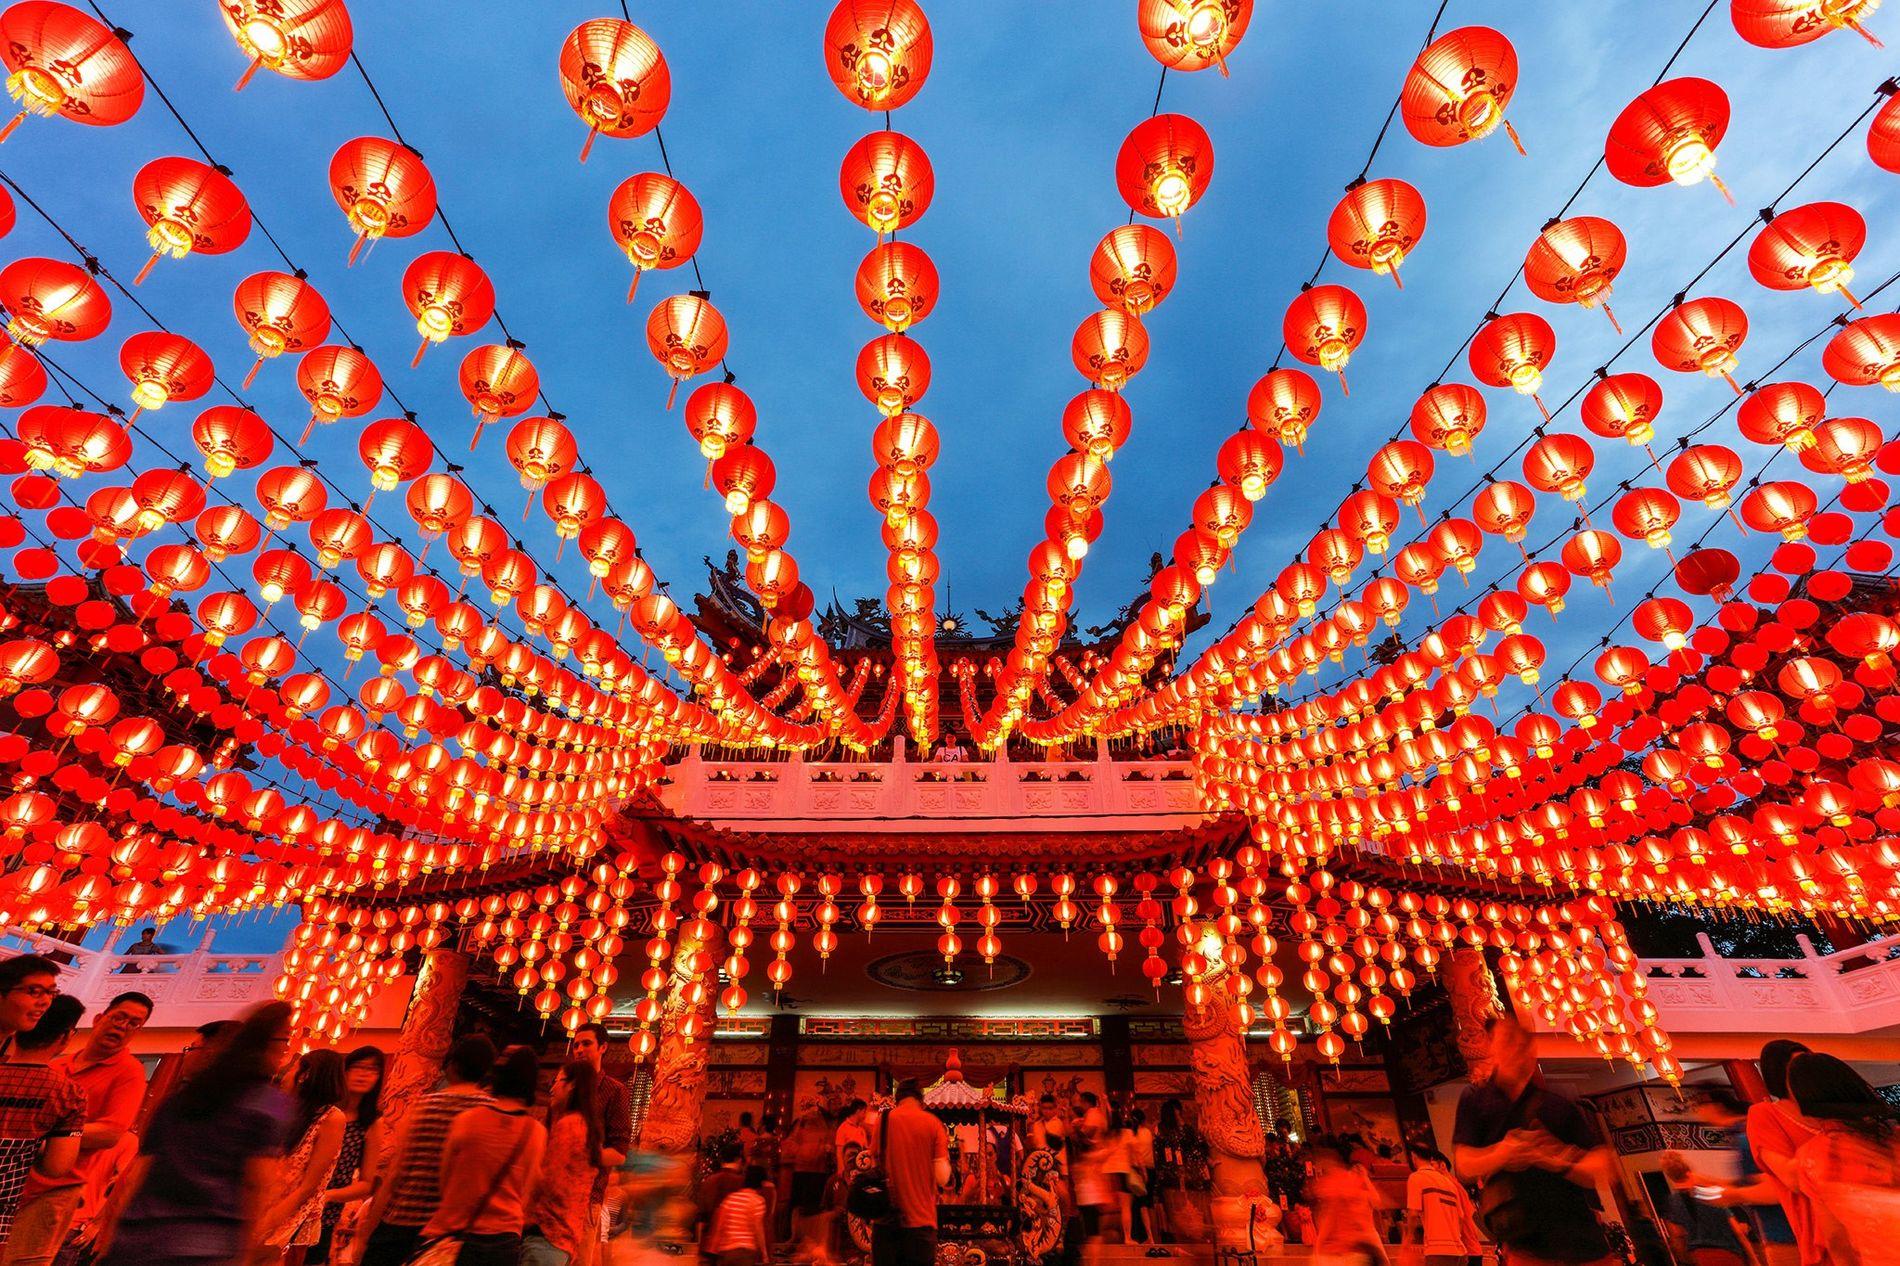 Lanterns glow at Thean Hou Temple in Kuala Lumpur, Malaysia, during Chinese New Year.